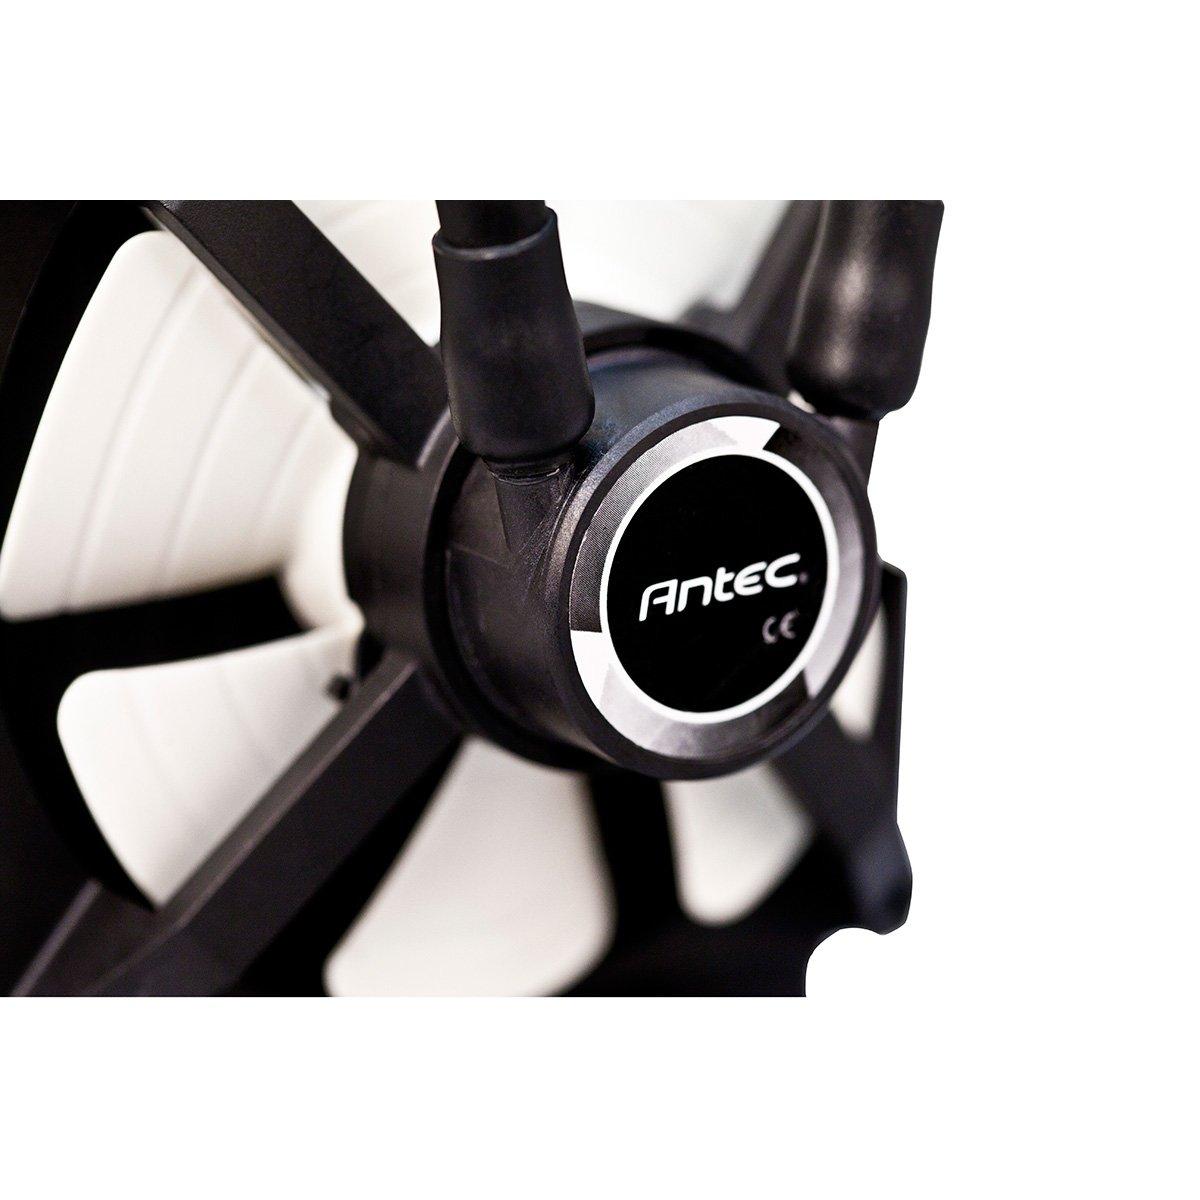 Antec H20 650 Cooling Kit KUHLER 650 Black by Antec